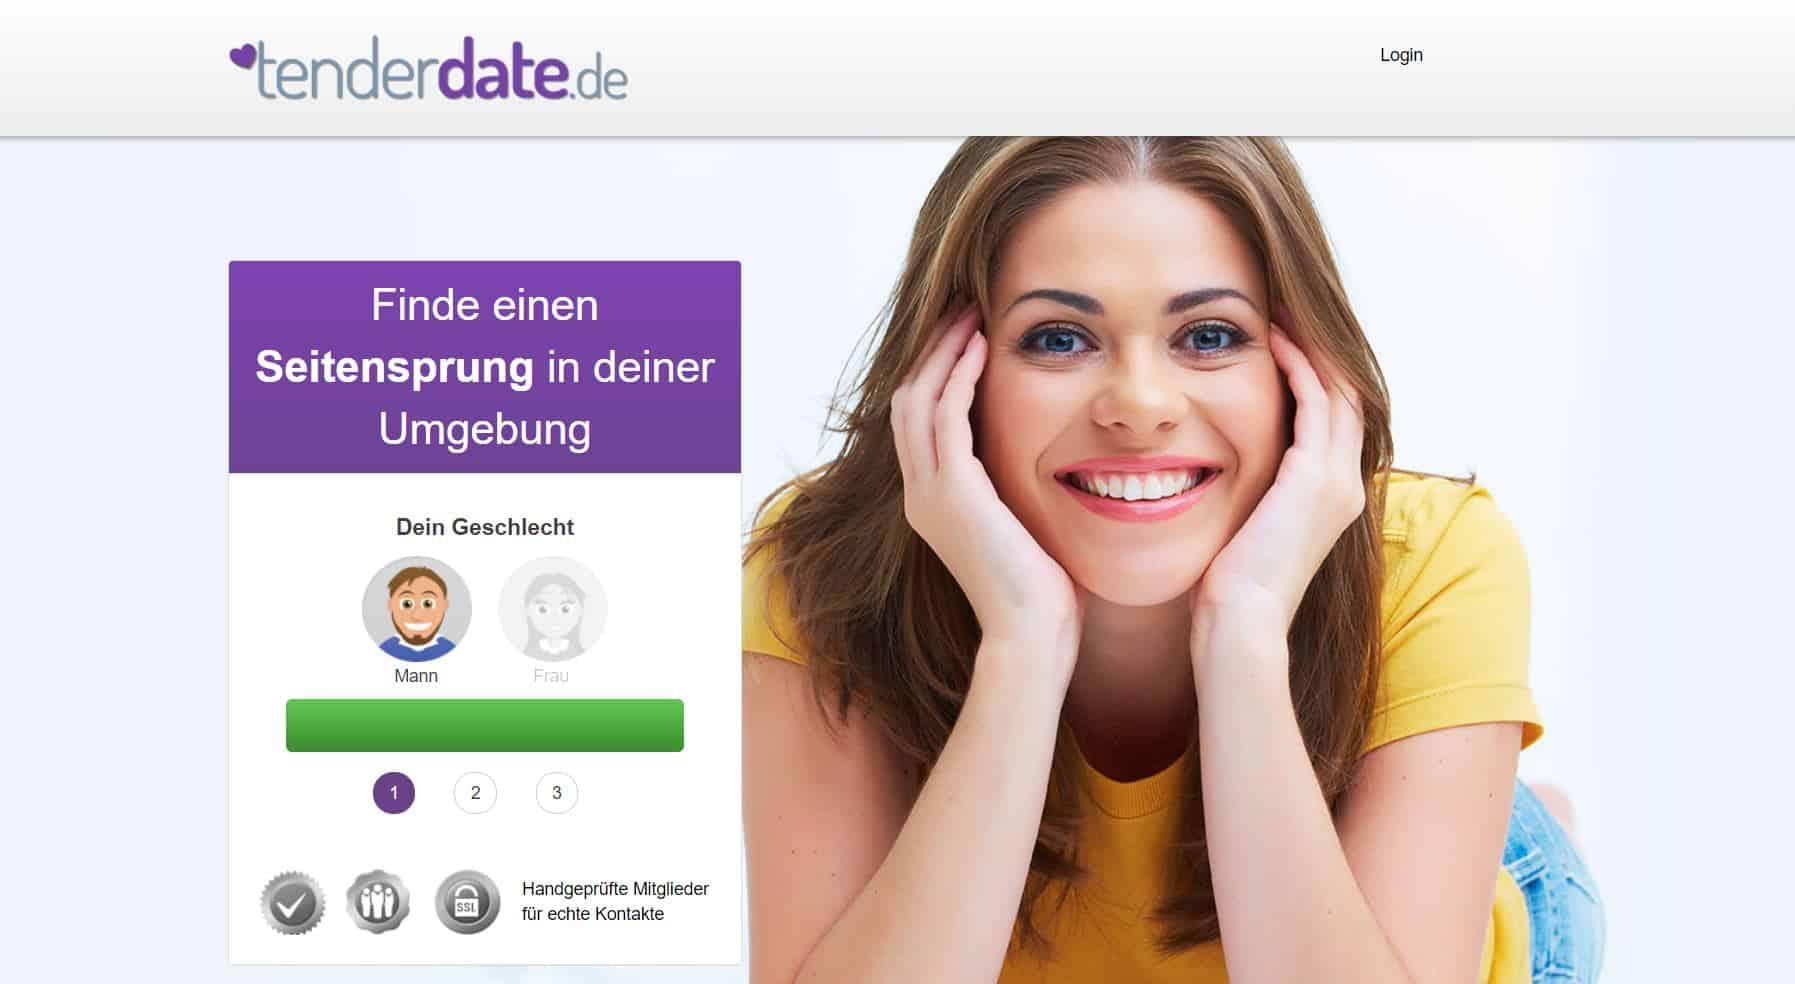 Testbericht: Tenderdate.de Abzocke